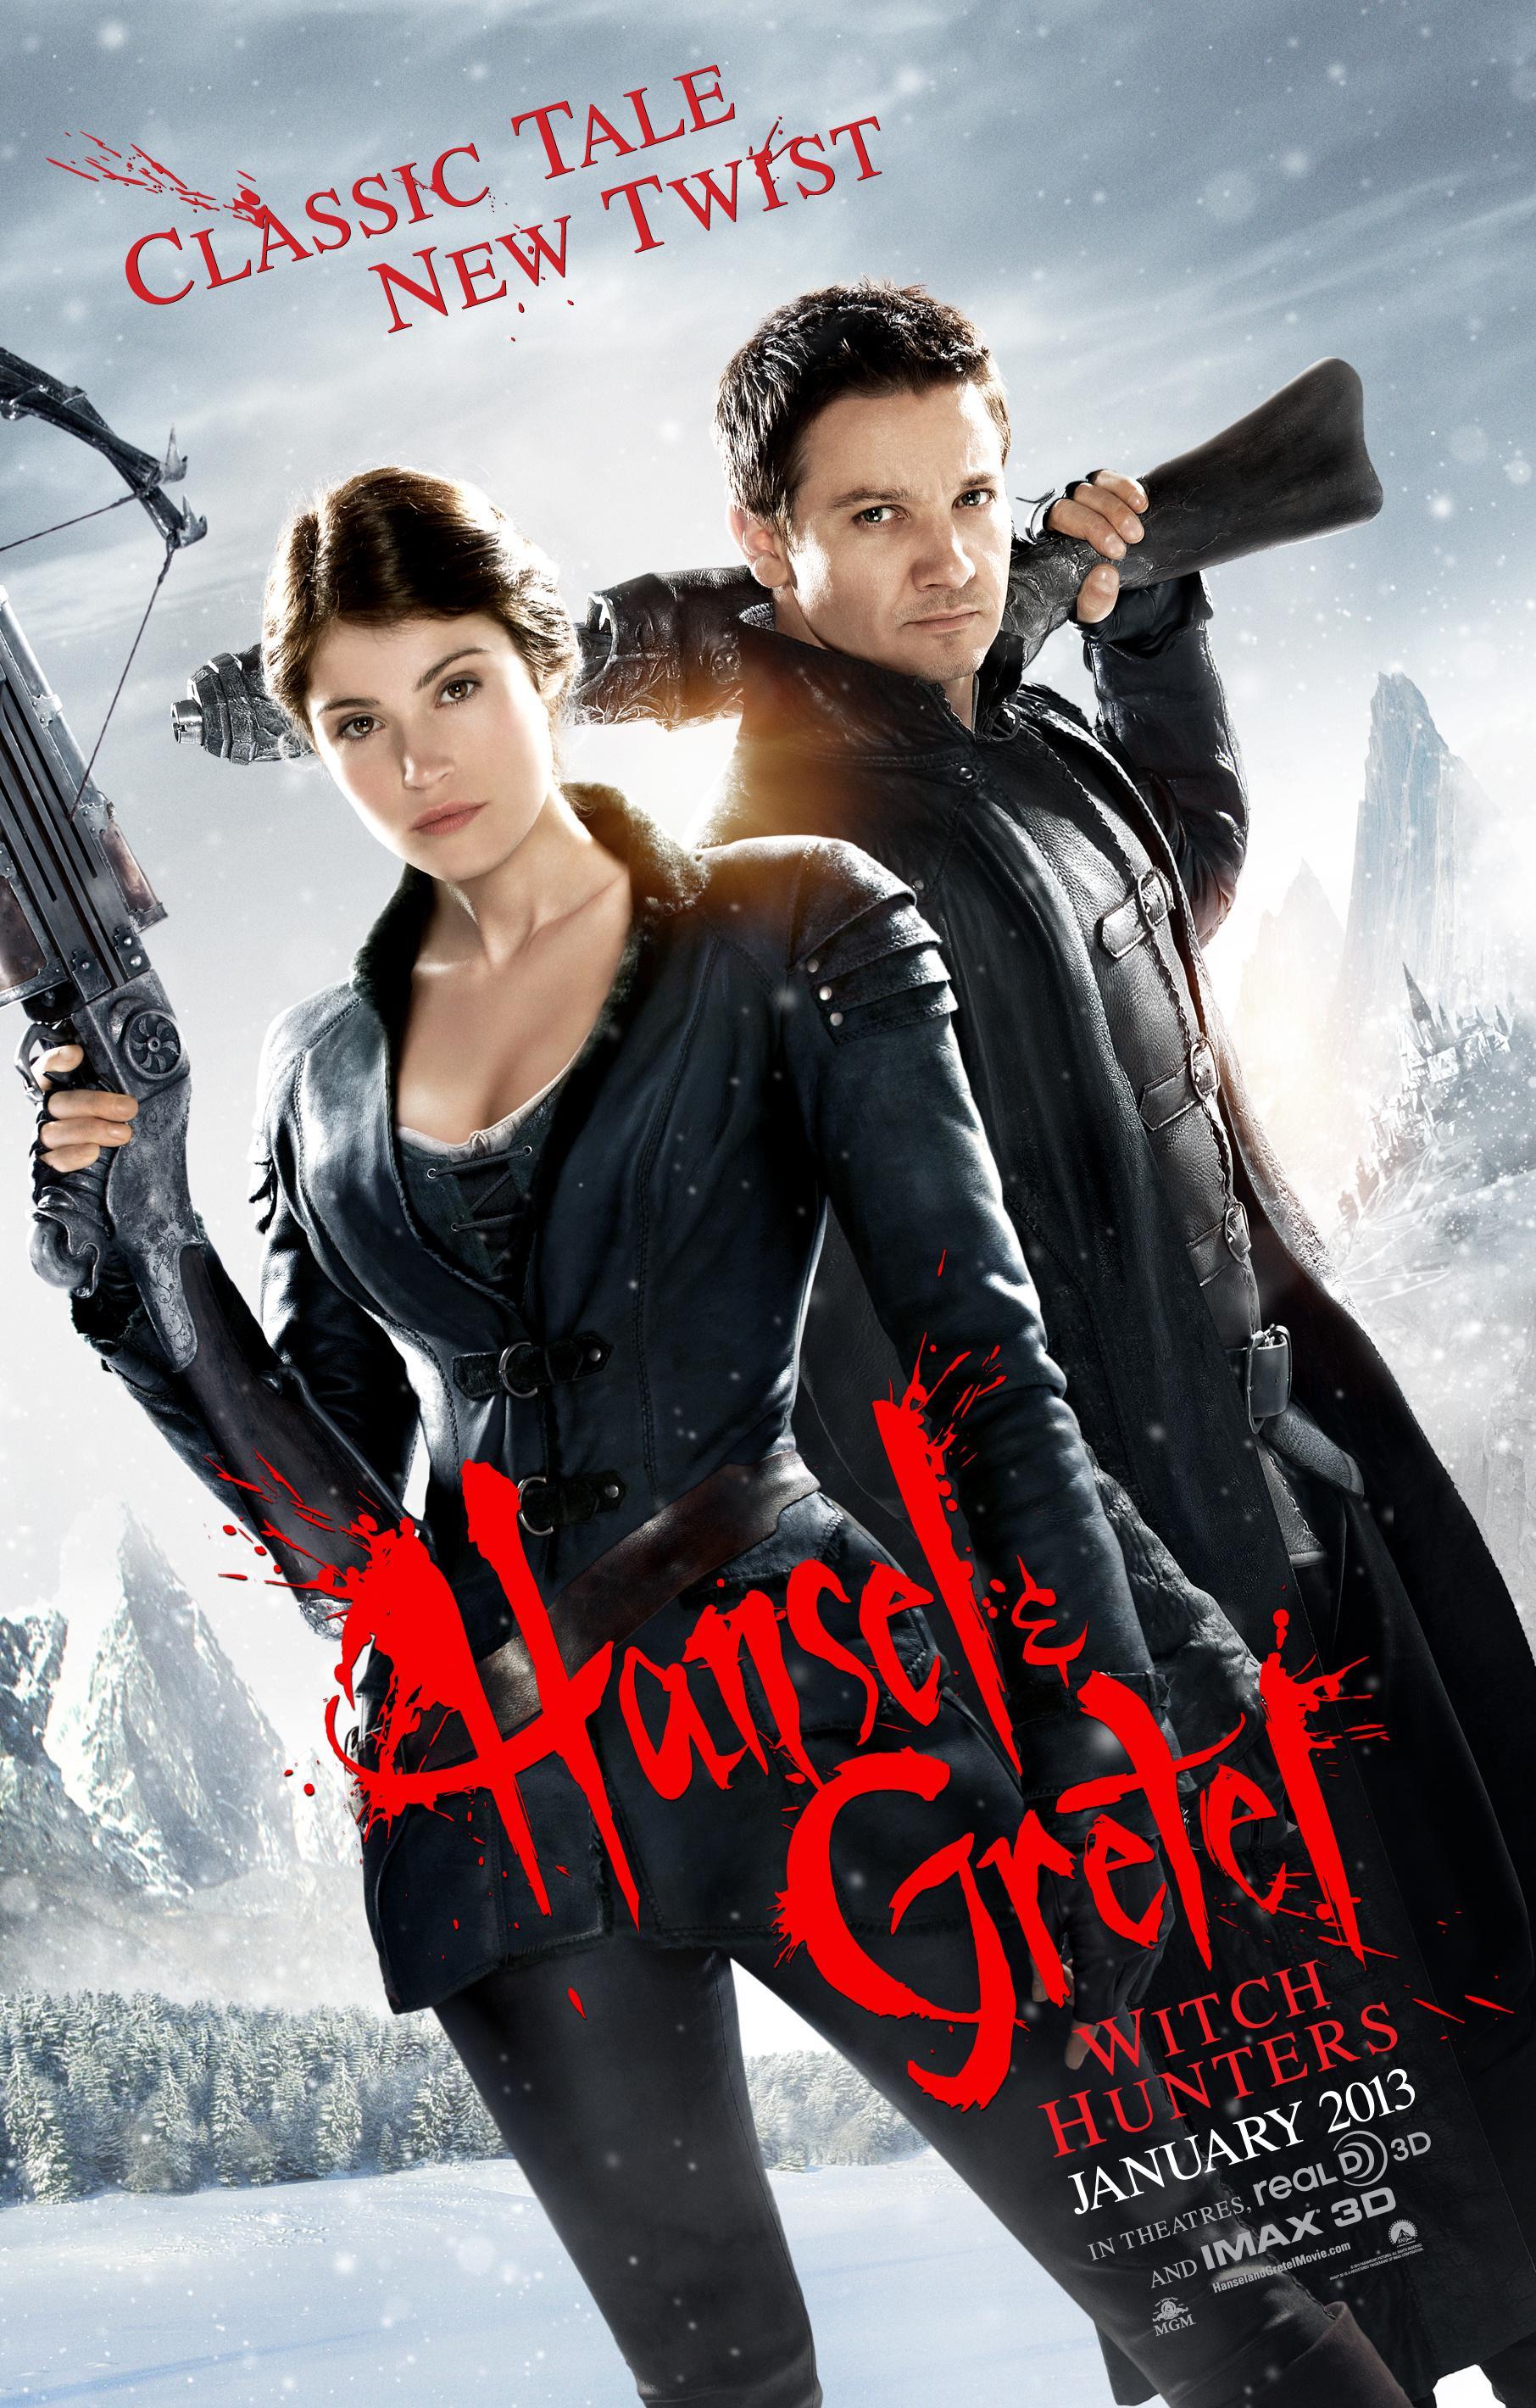 《韩赛尔与格蕾特:女巫猎人》(Hansel and Gretel: Witch Hunters)新曝海报限制级预告